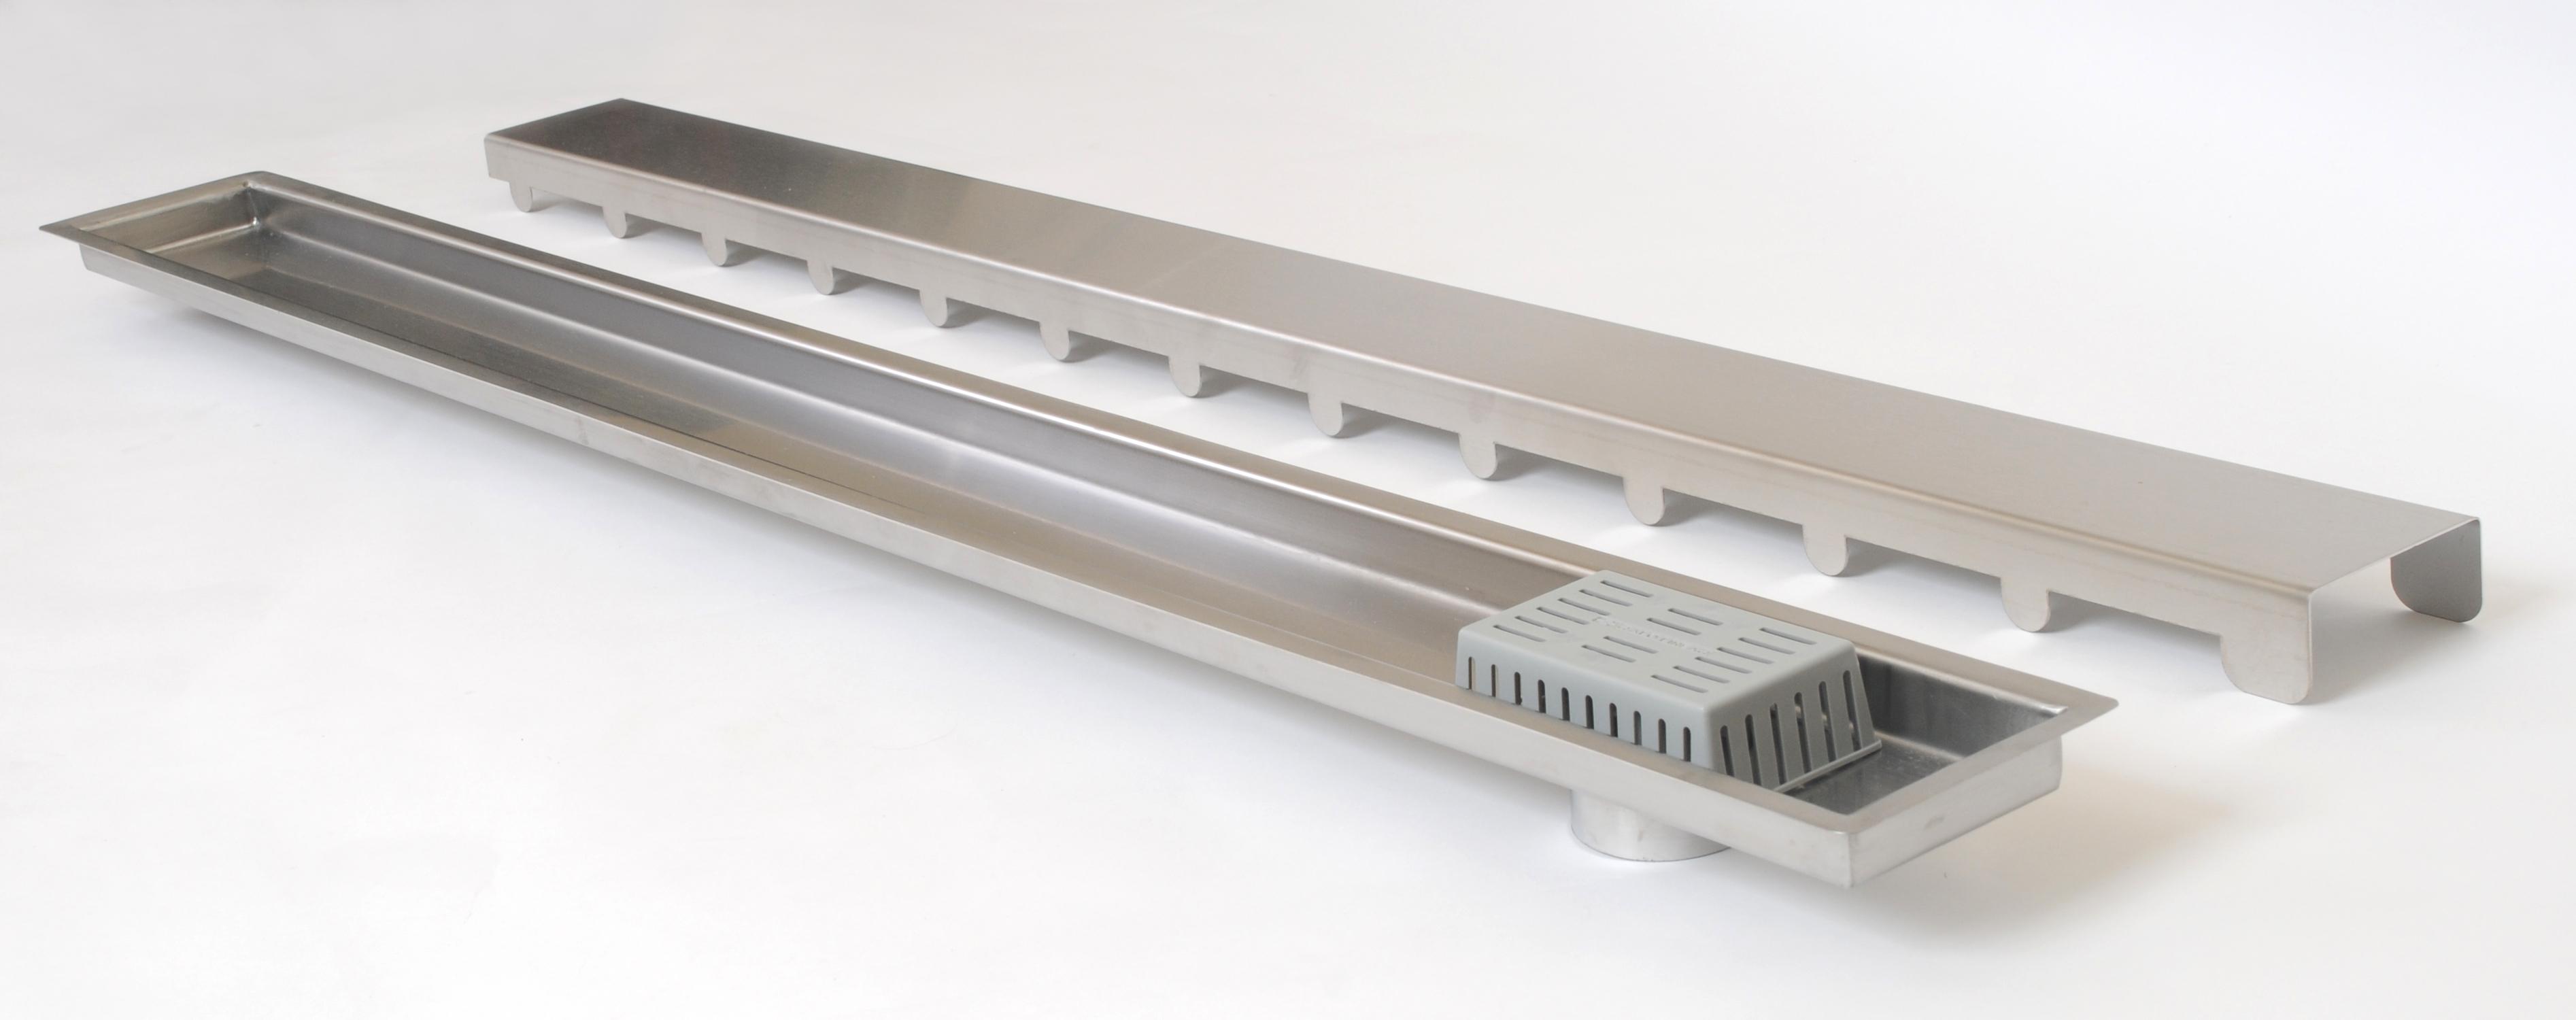 Ralo Linear Multi Master foi a primeira peça criada pela Ralo Linear  #70665B 3788 1500